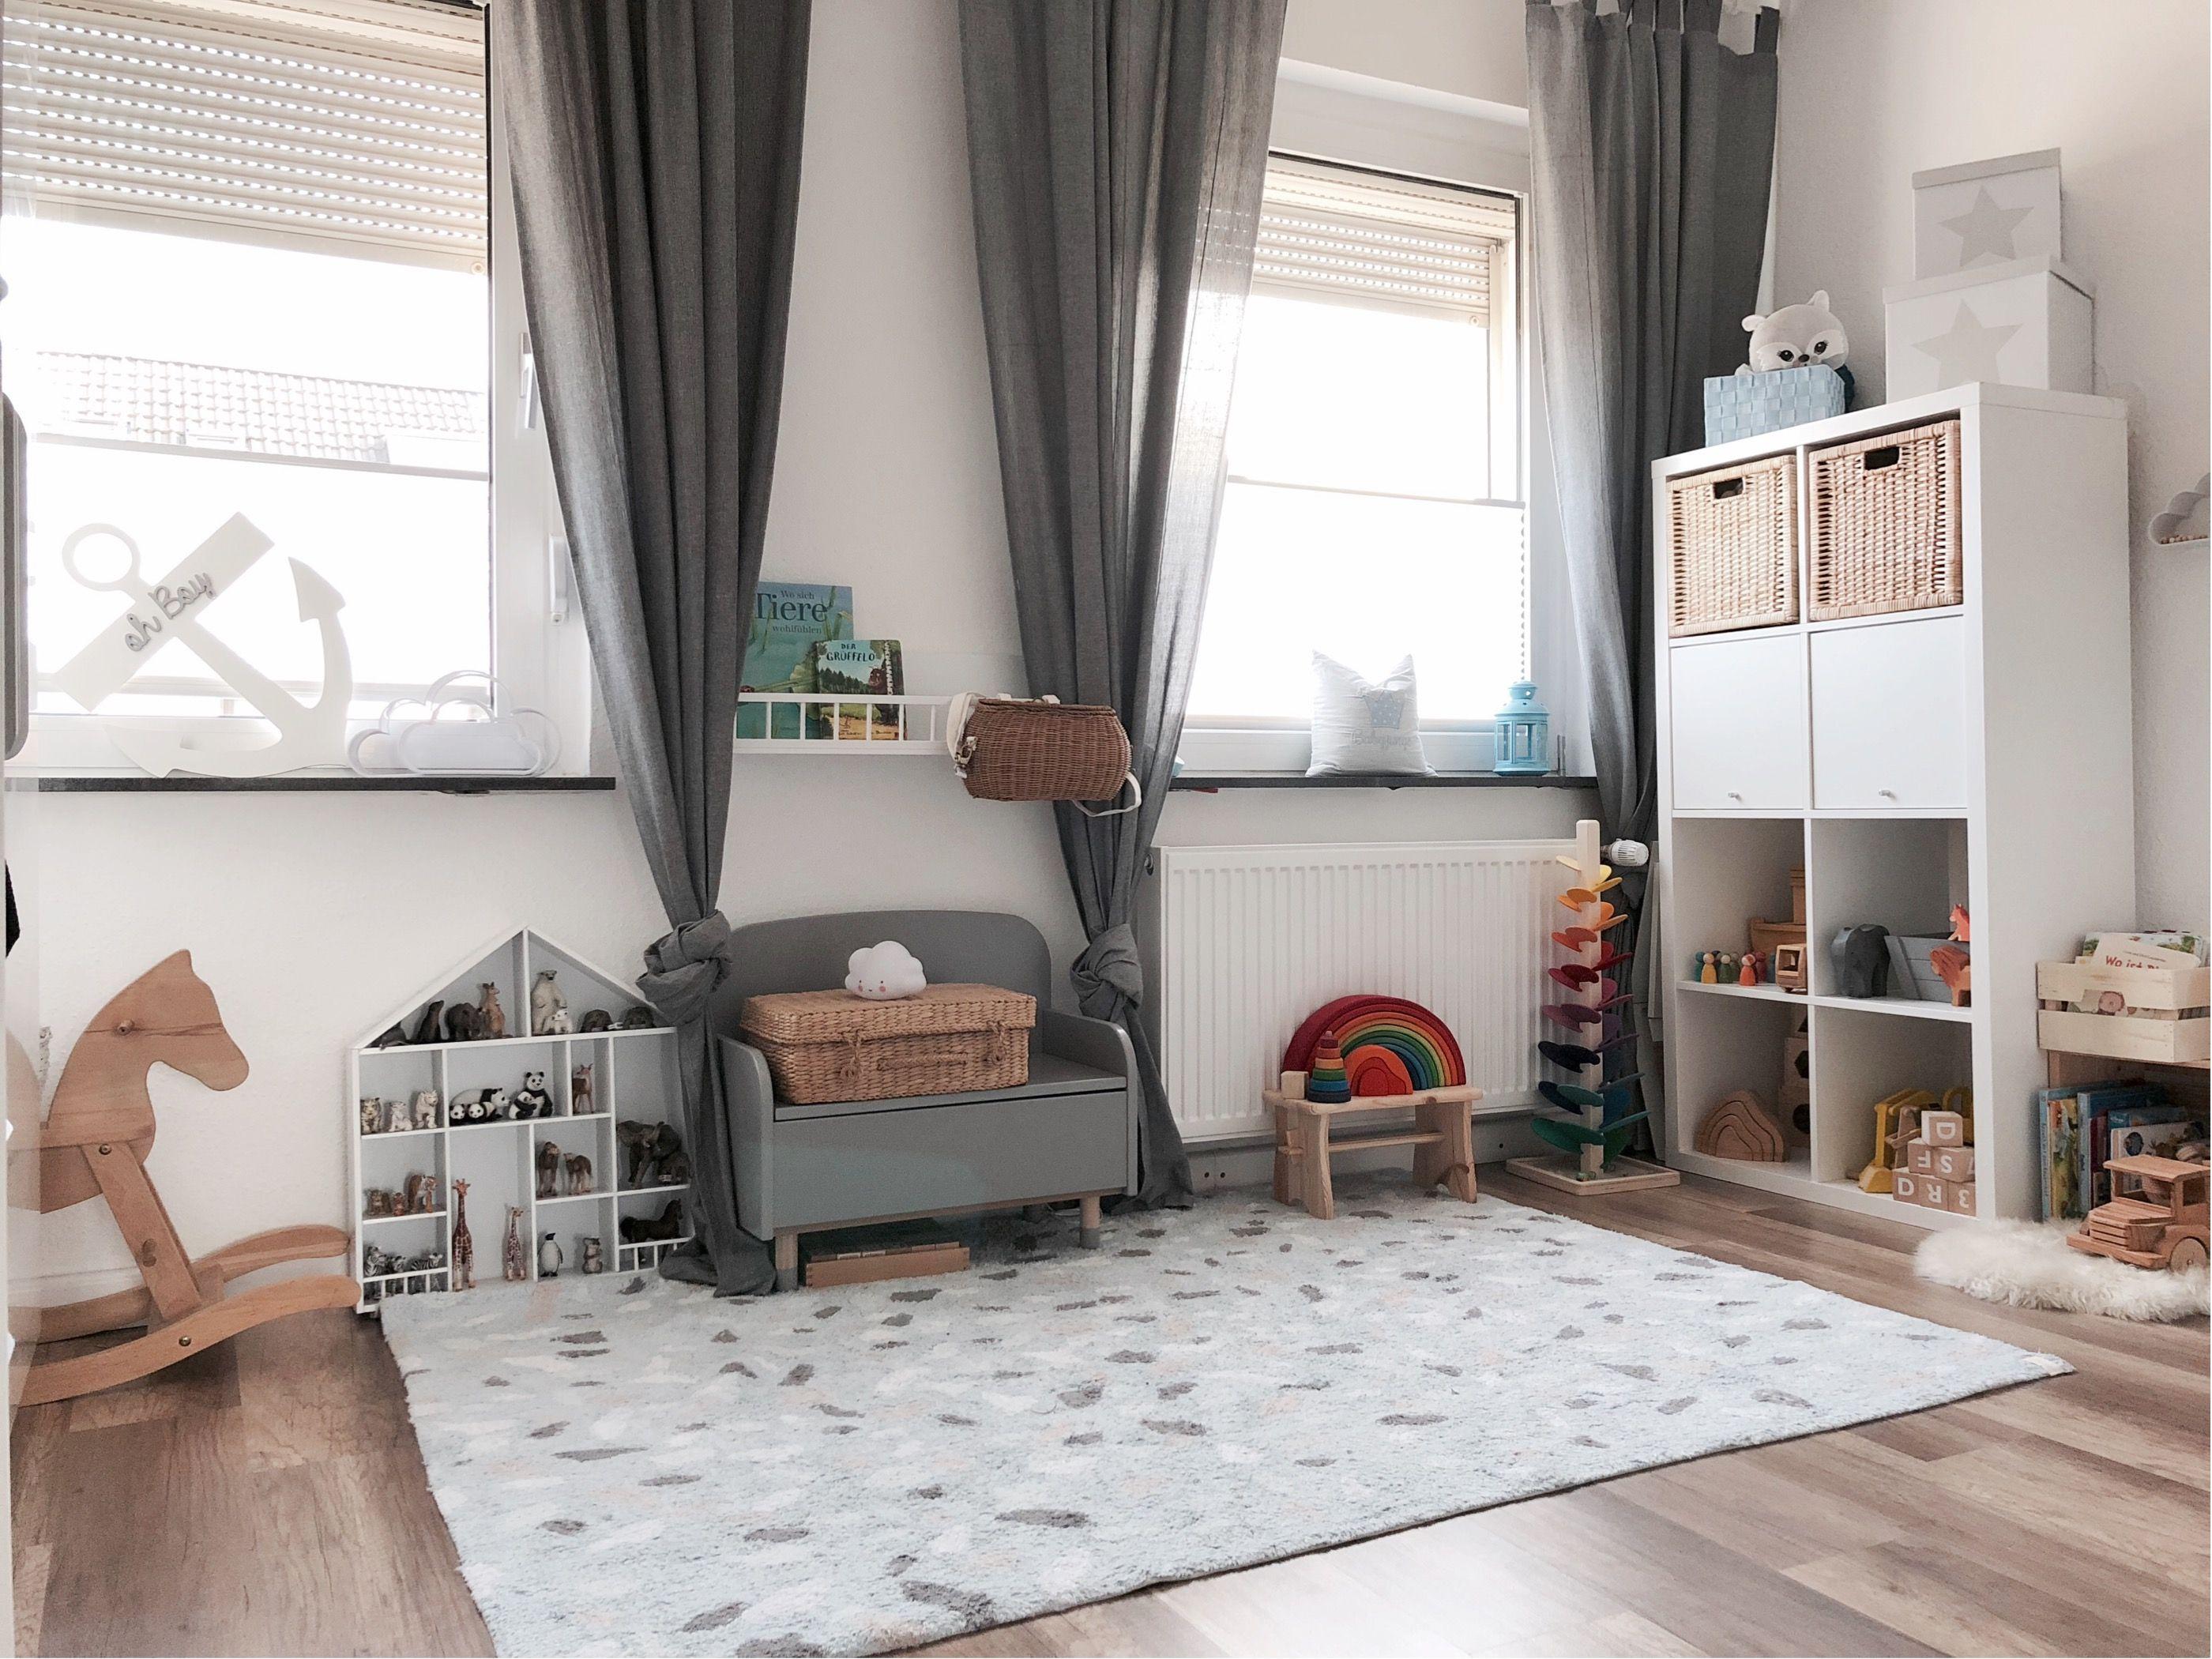 Kinderzimmer Alessia ~ Kidsroom decor kinderzimmer holzspielzeug woodentoys